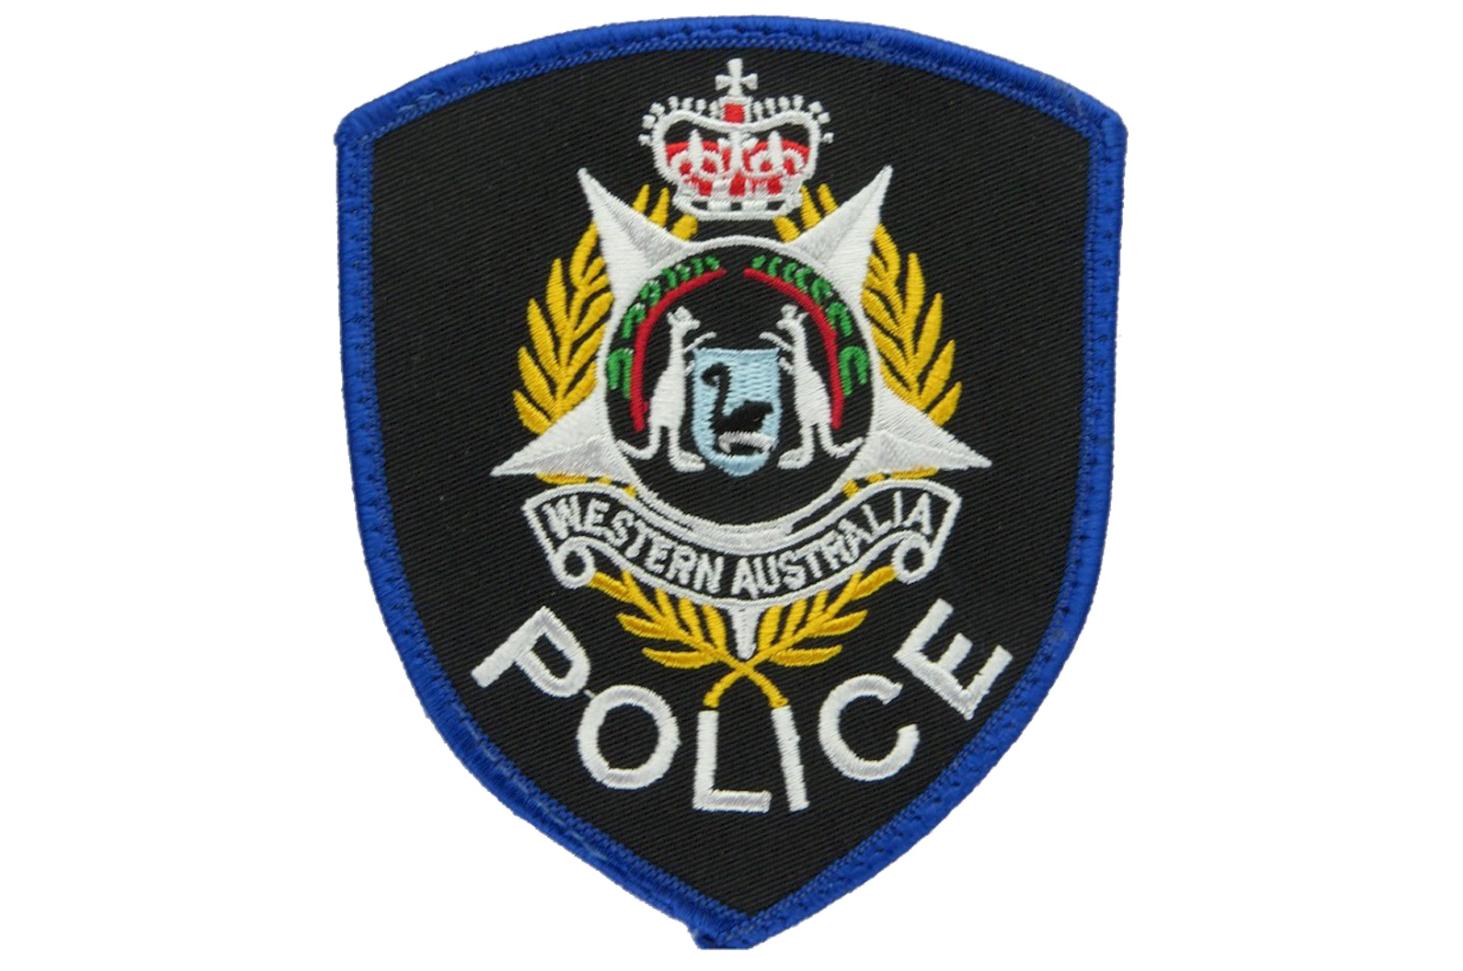 West Australian Police (20 Sites)